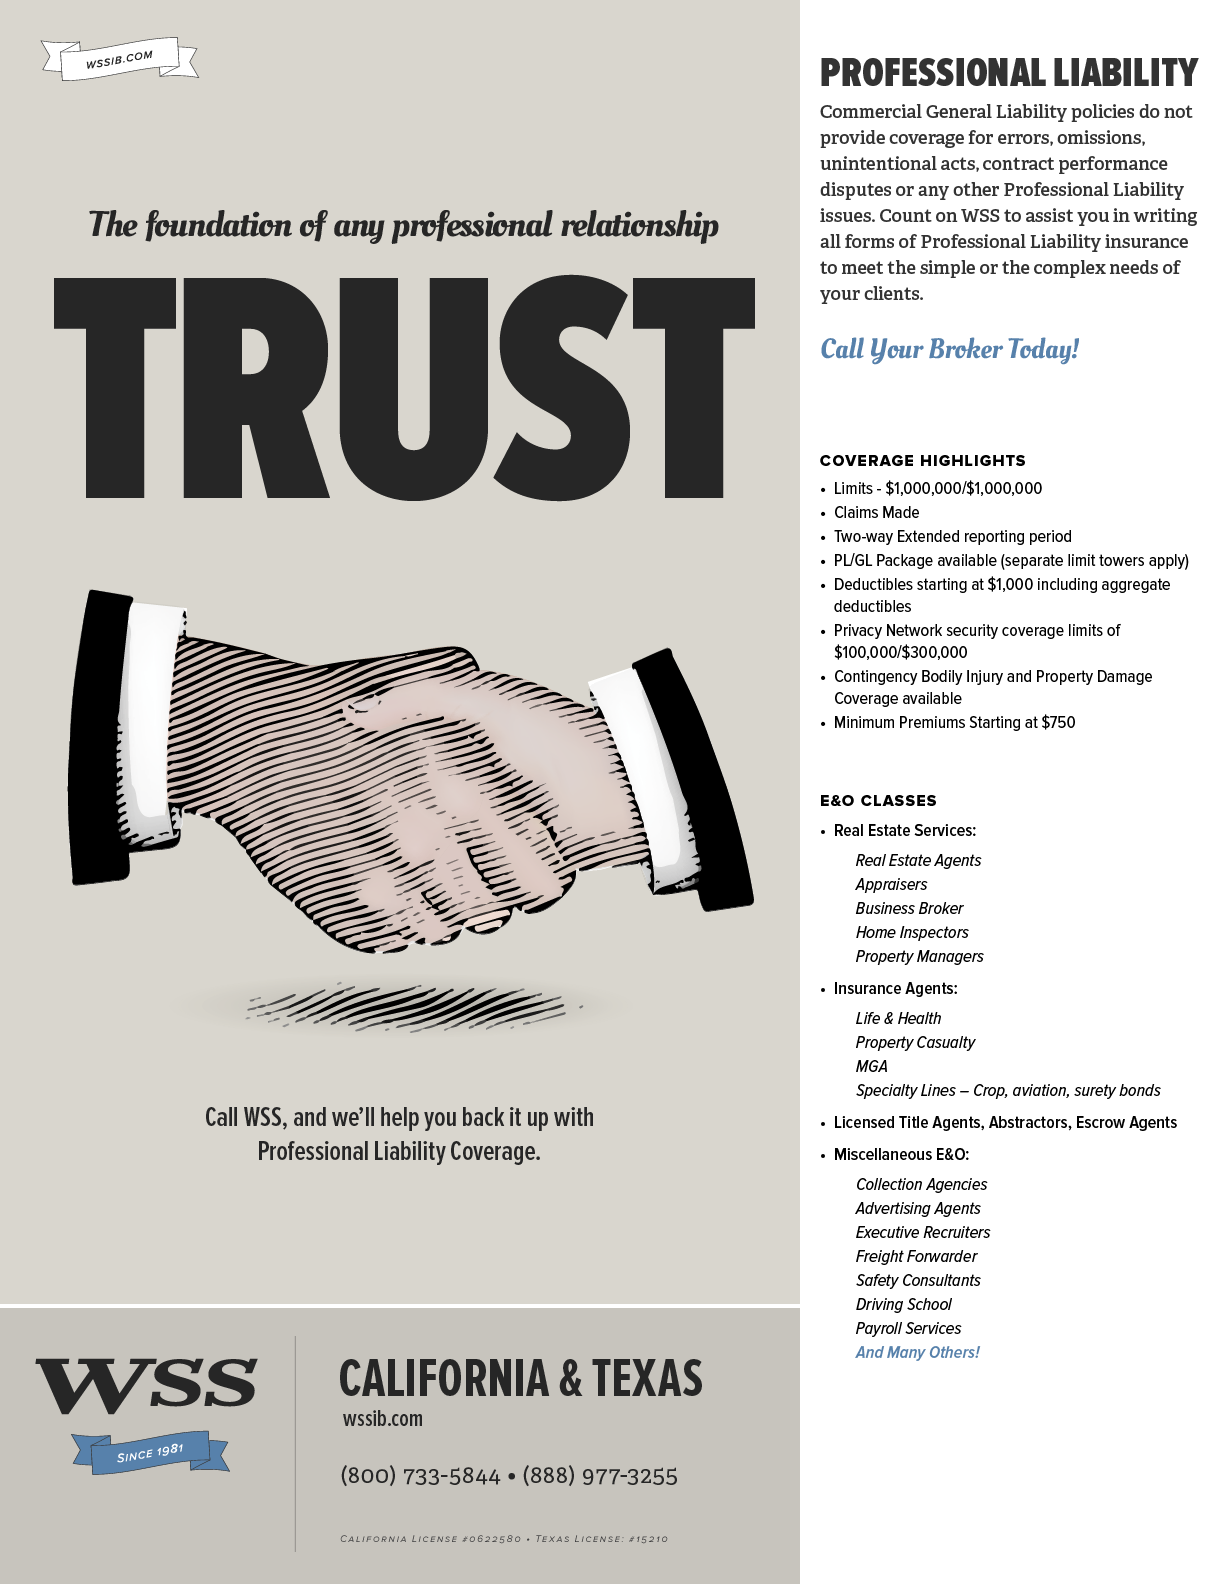 WSS-Flyer-ProfessionalLiability.png